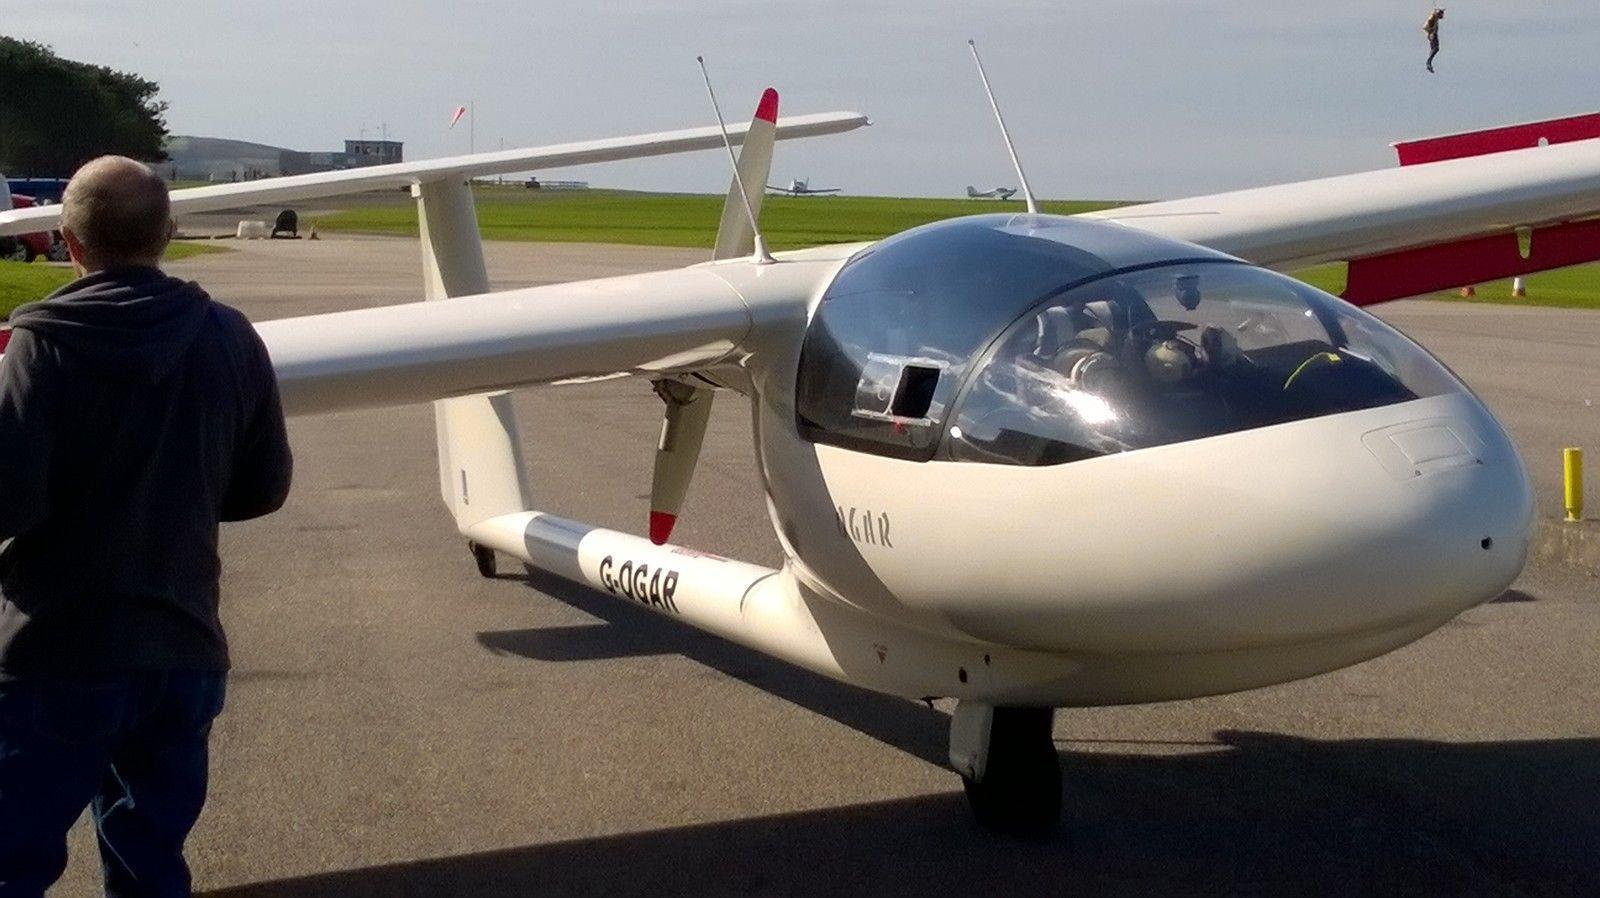 SZD - 45A - OGAR Touring Motor Glider  Hangered at